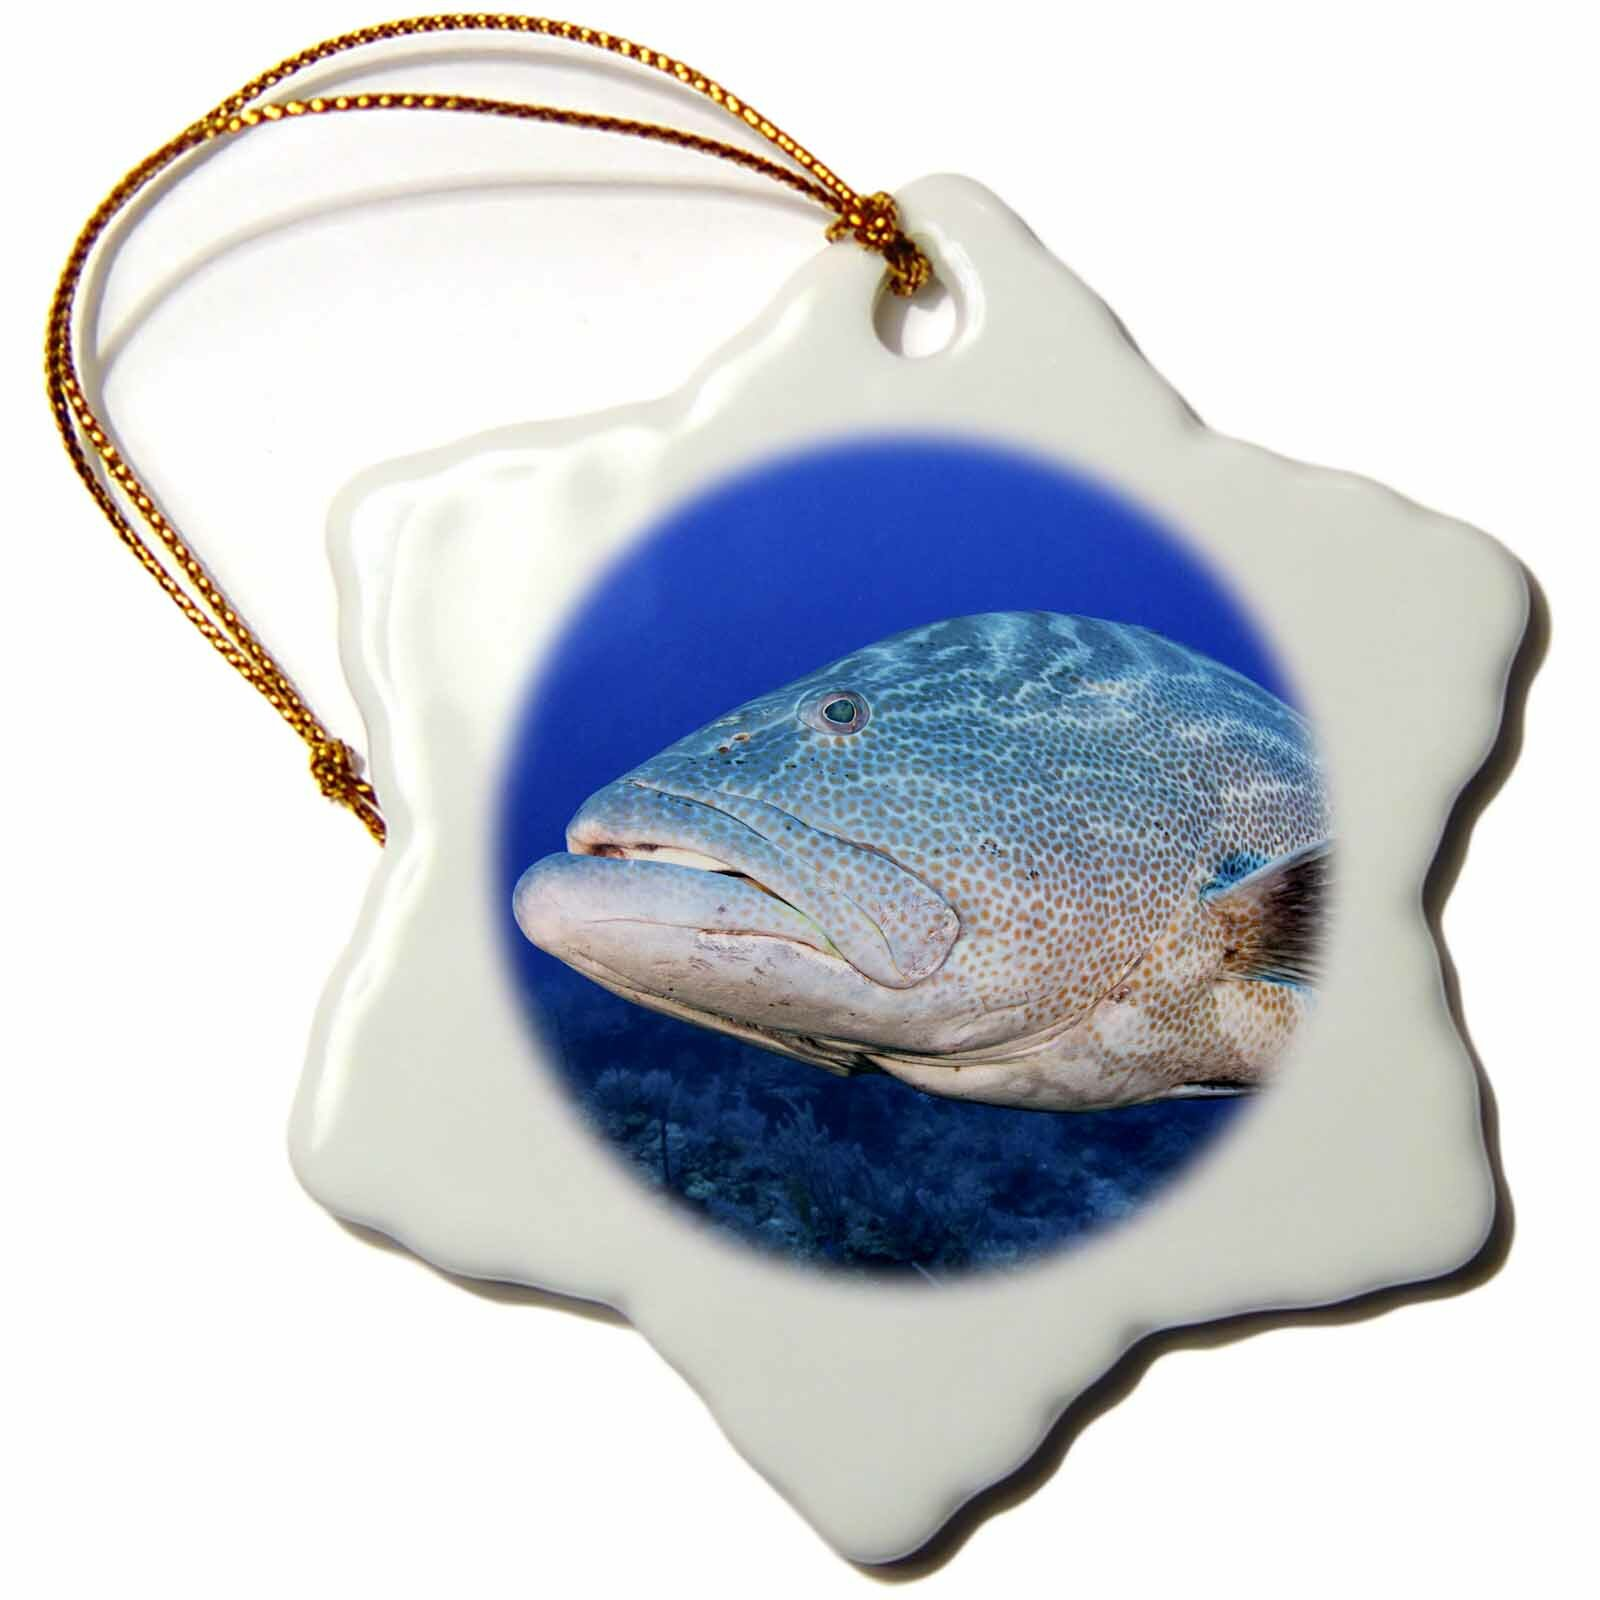 The Holiday Aisle Grouper Jardines De La Reina Np Cuba Snowflake Holiday Shaped Ornament Wayfair